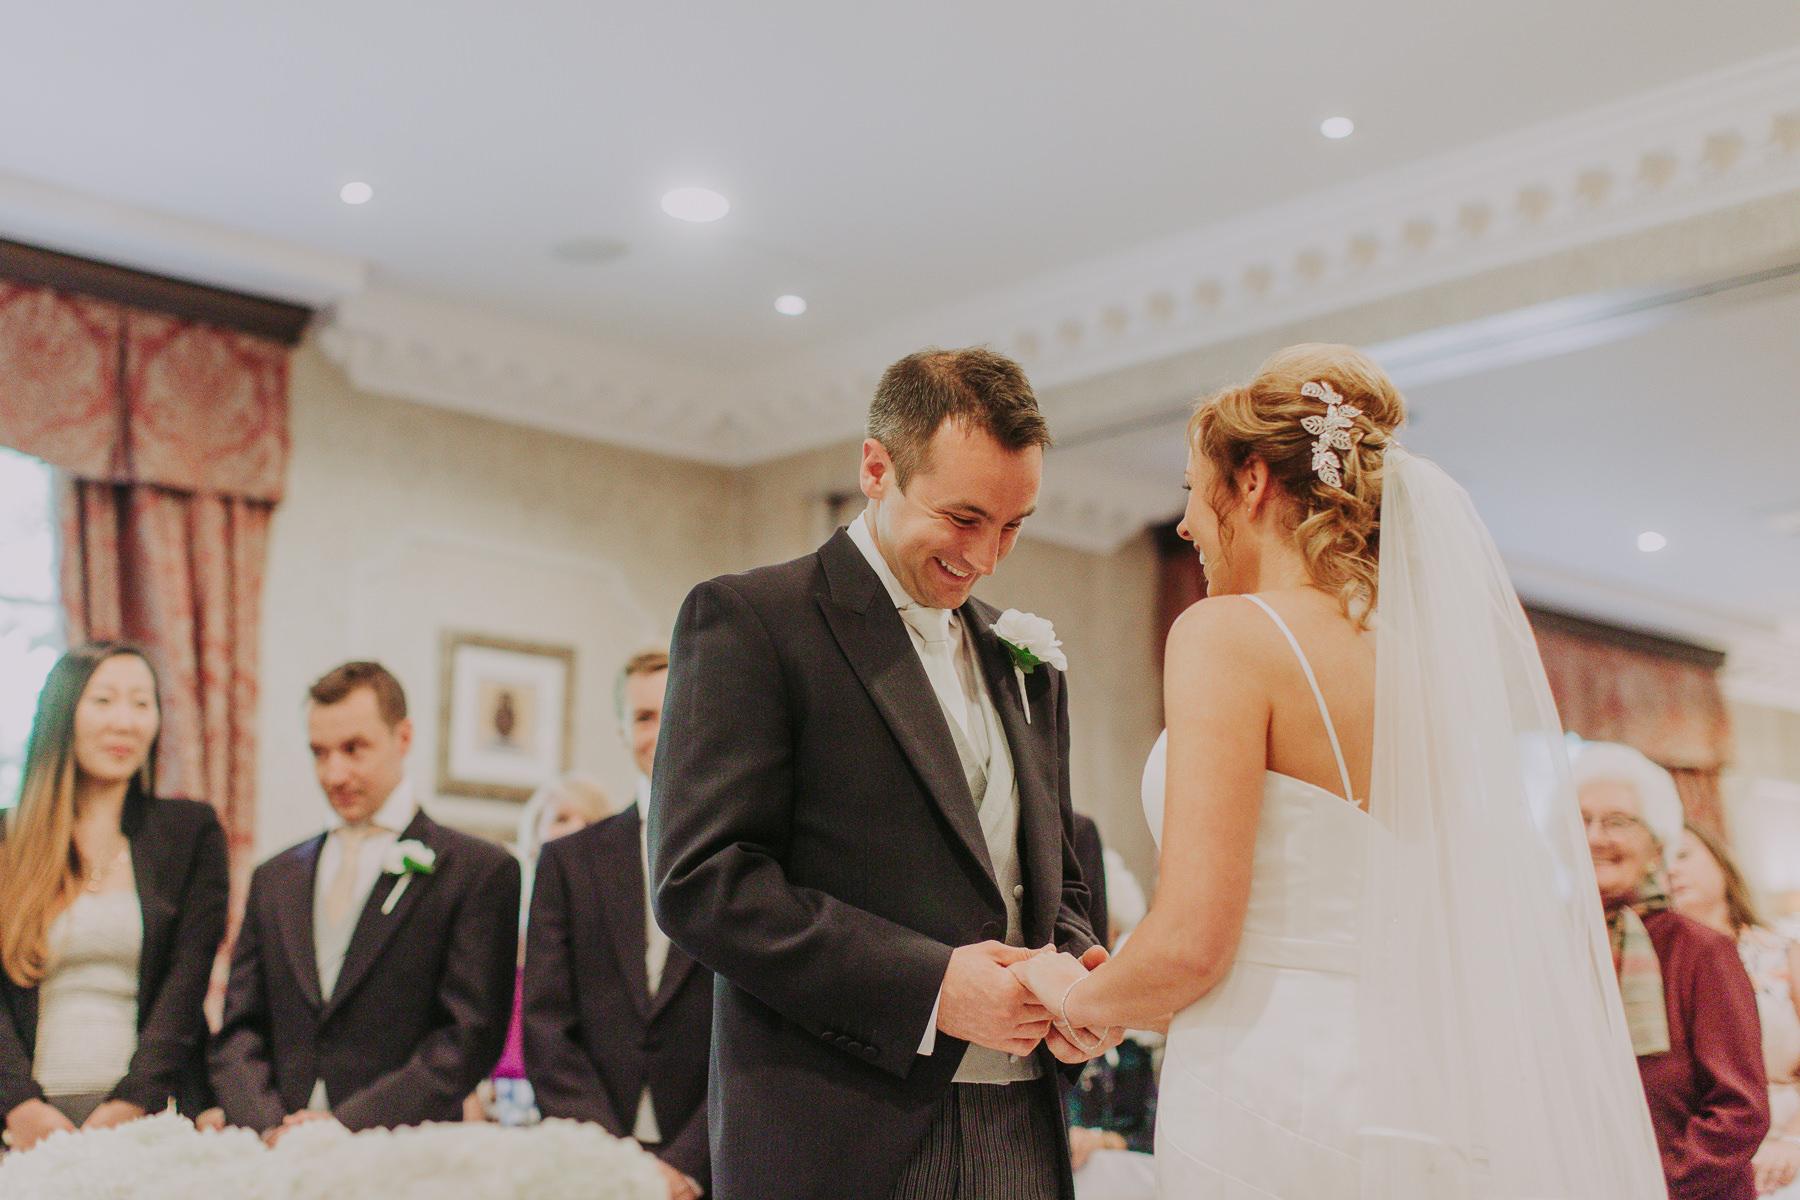 Meg & Jon | Wood Hall Hotel Wedding 48